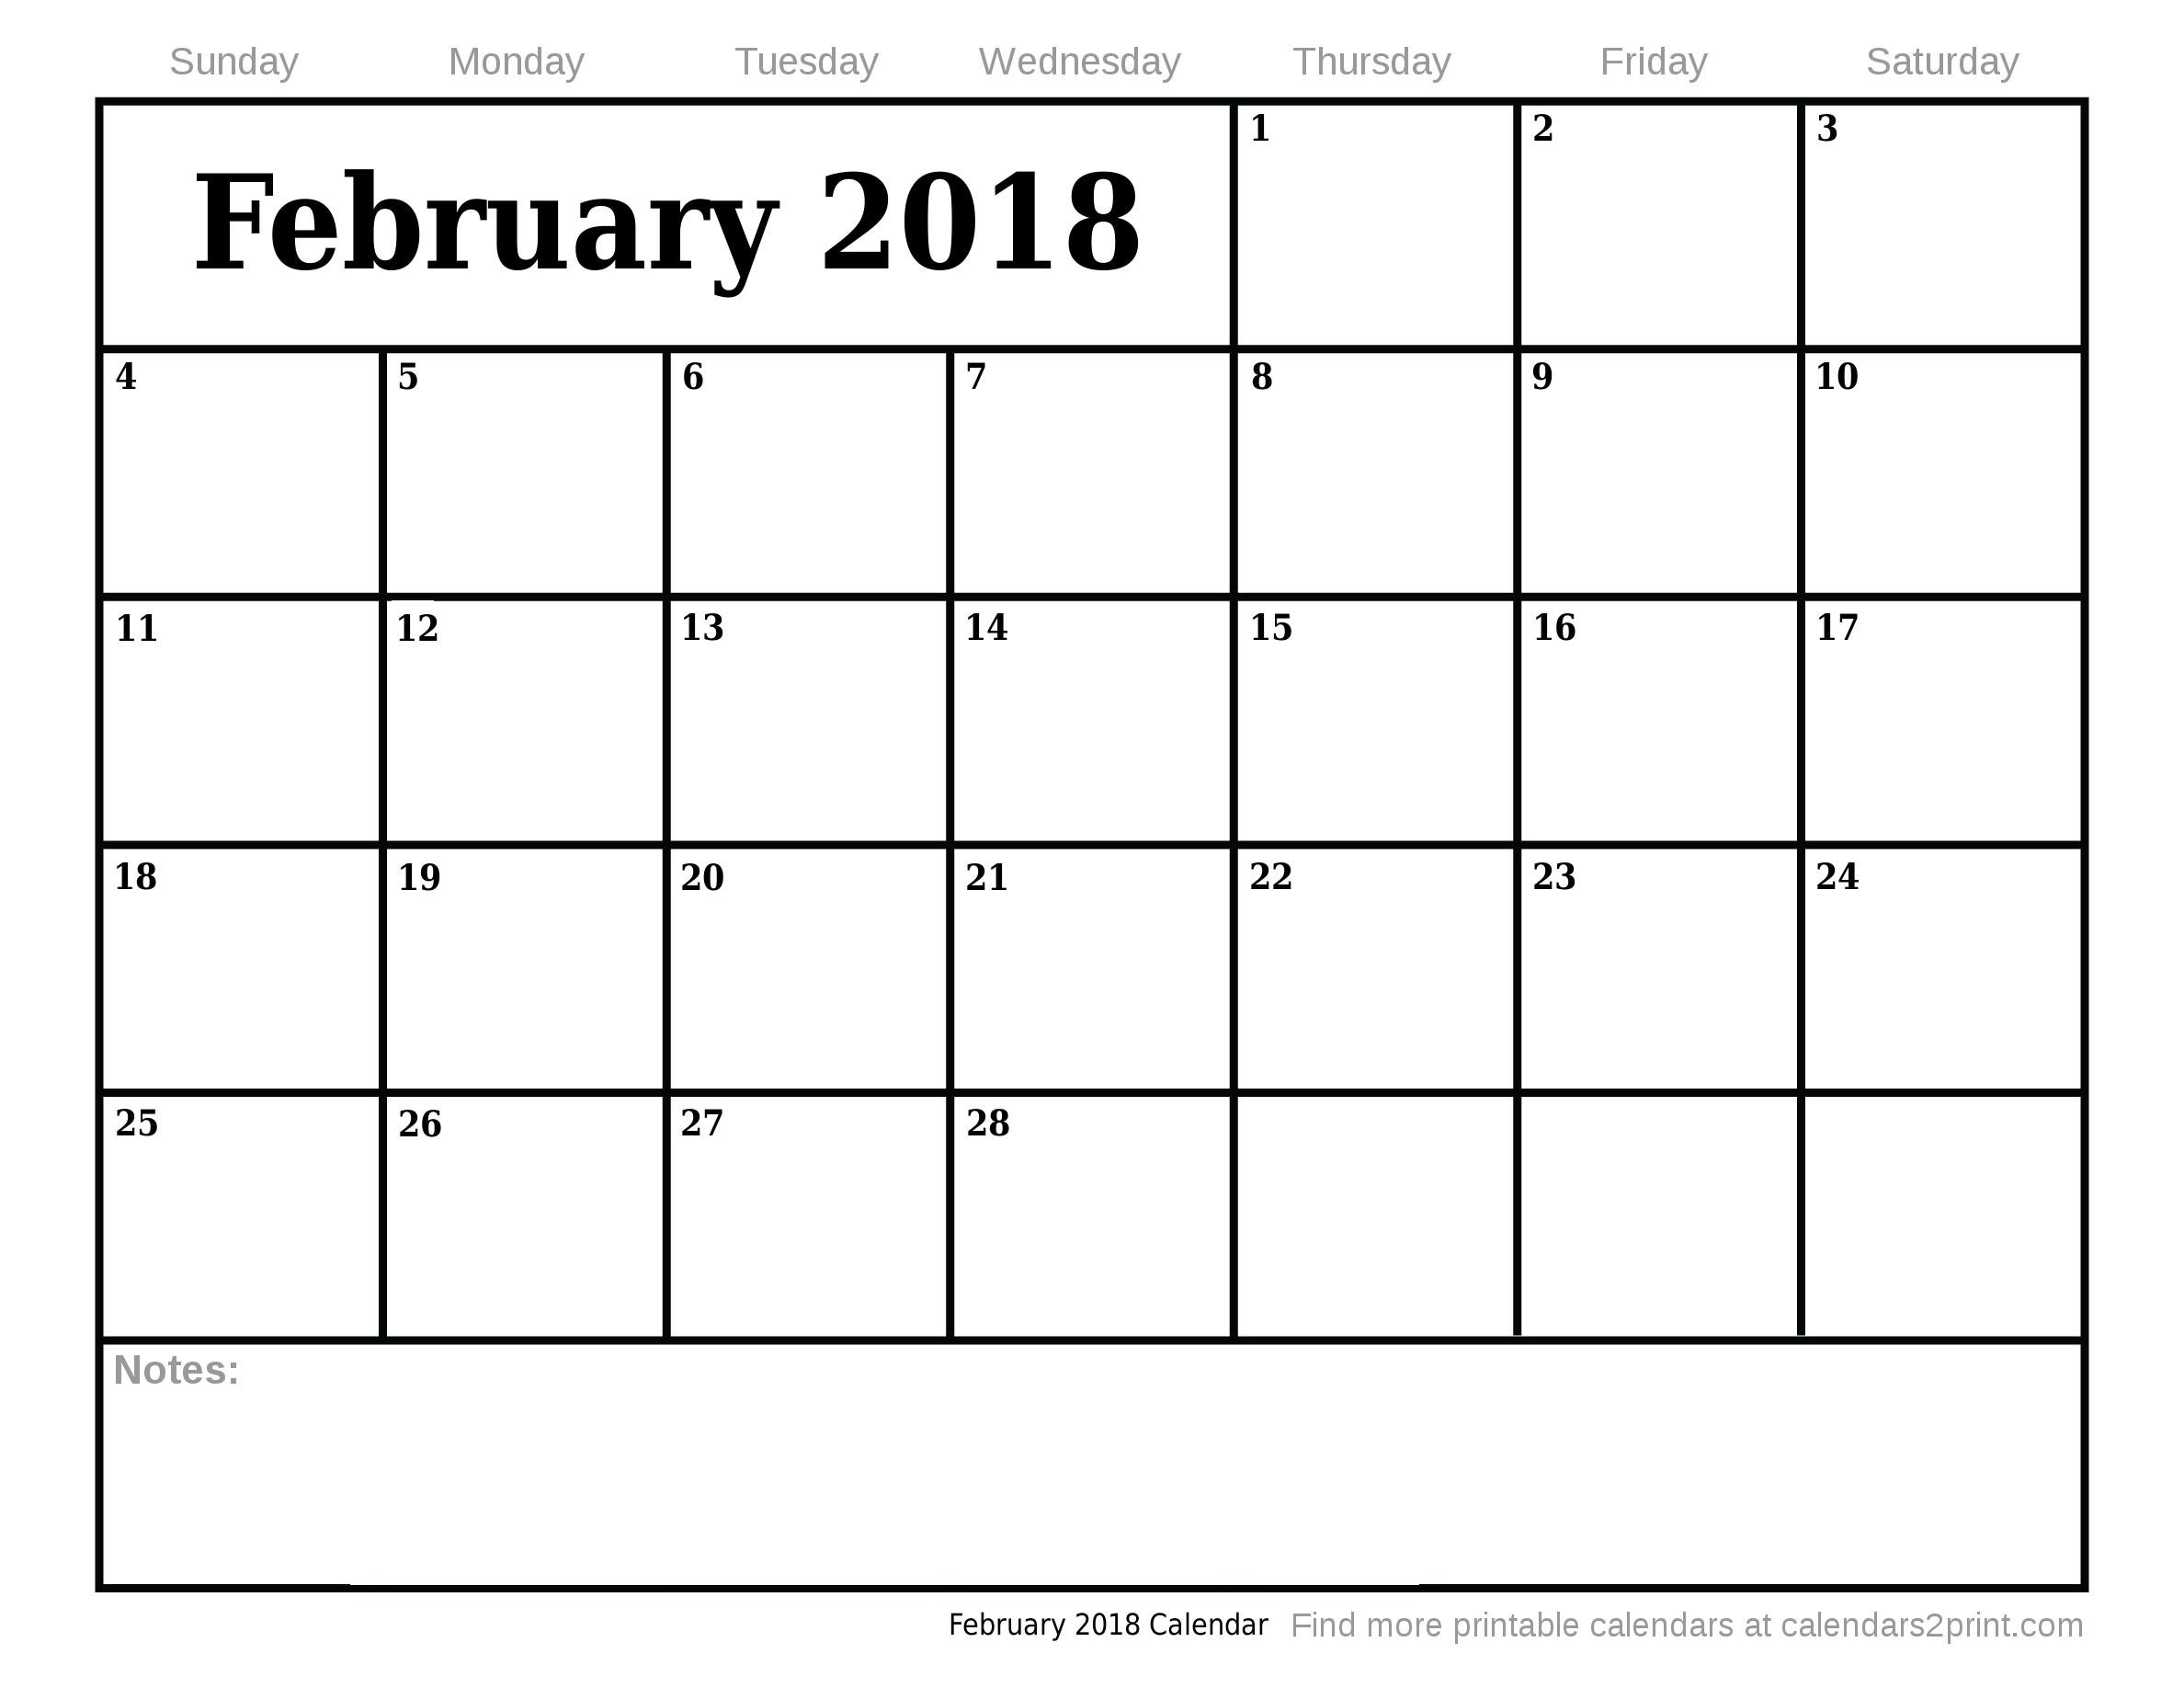 February 2018 Printable Calendar, March 2018 Calendar